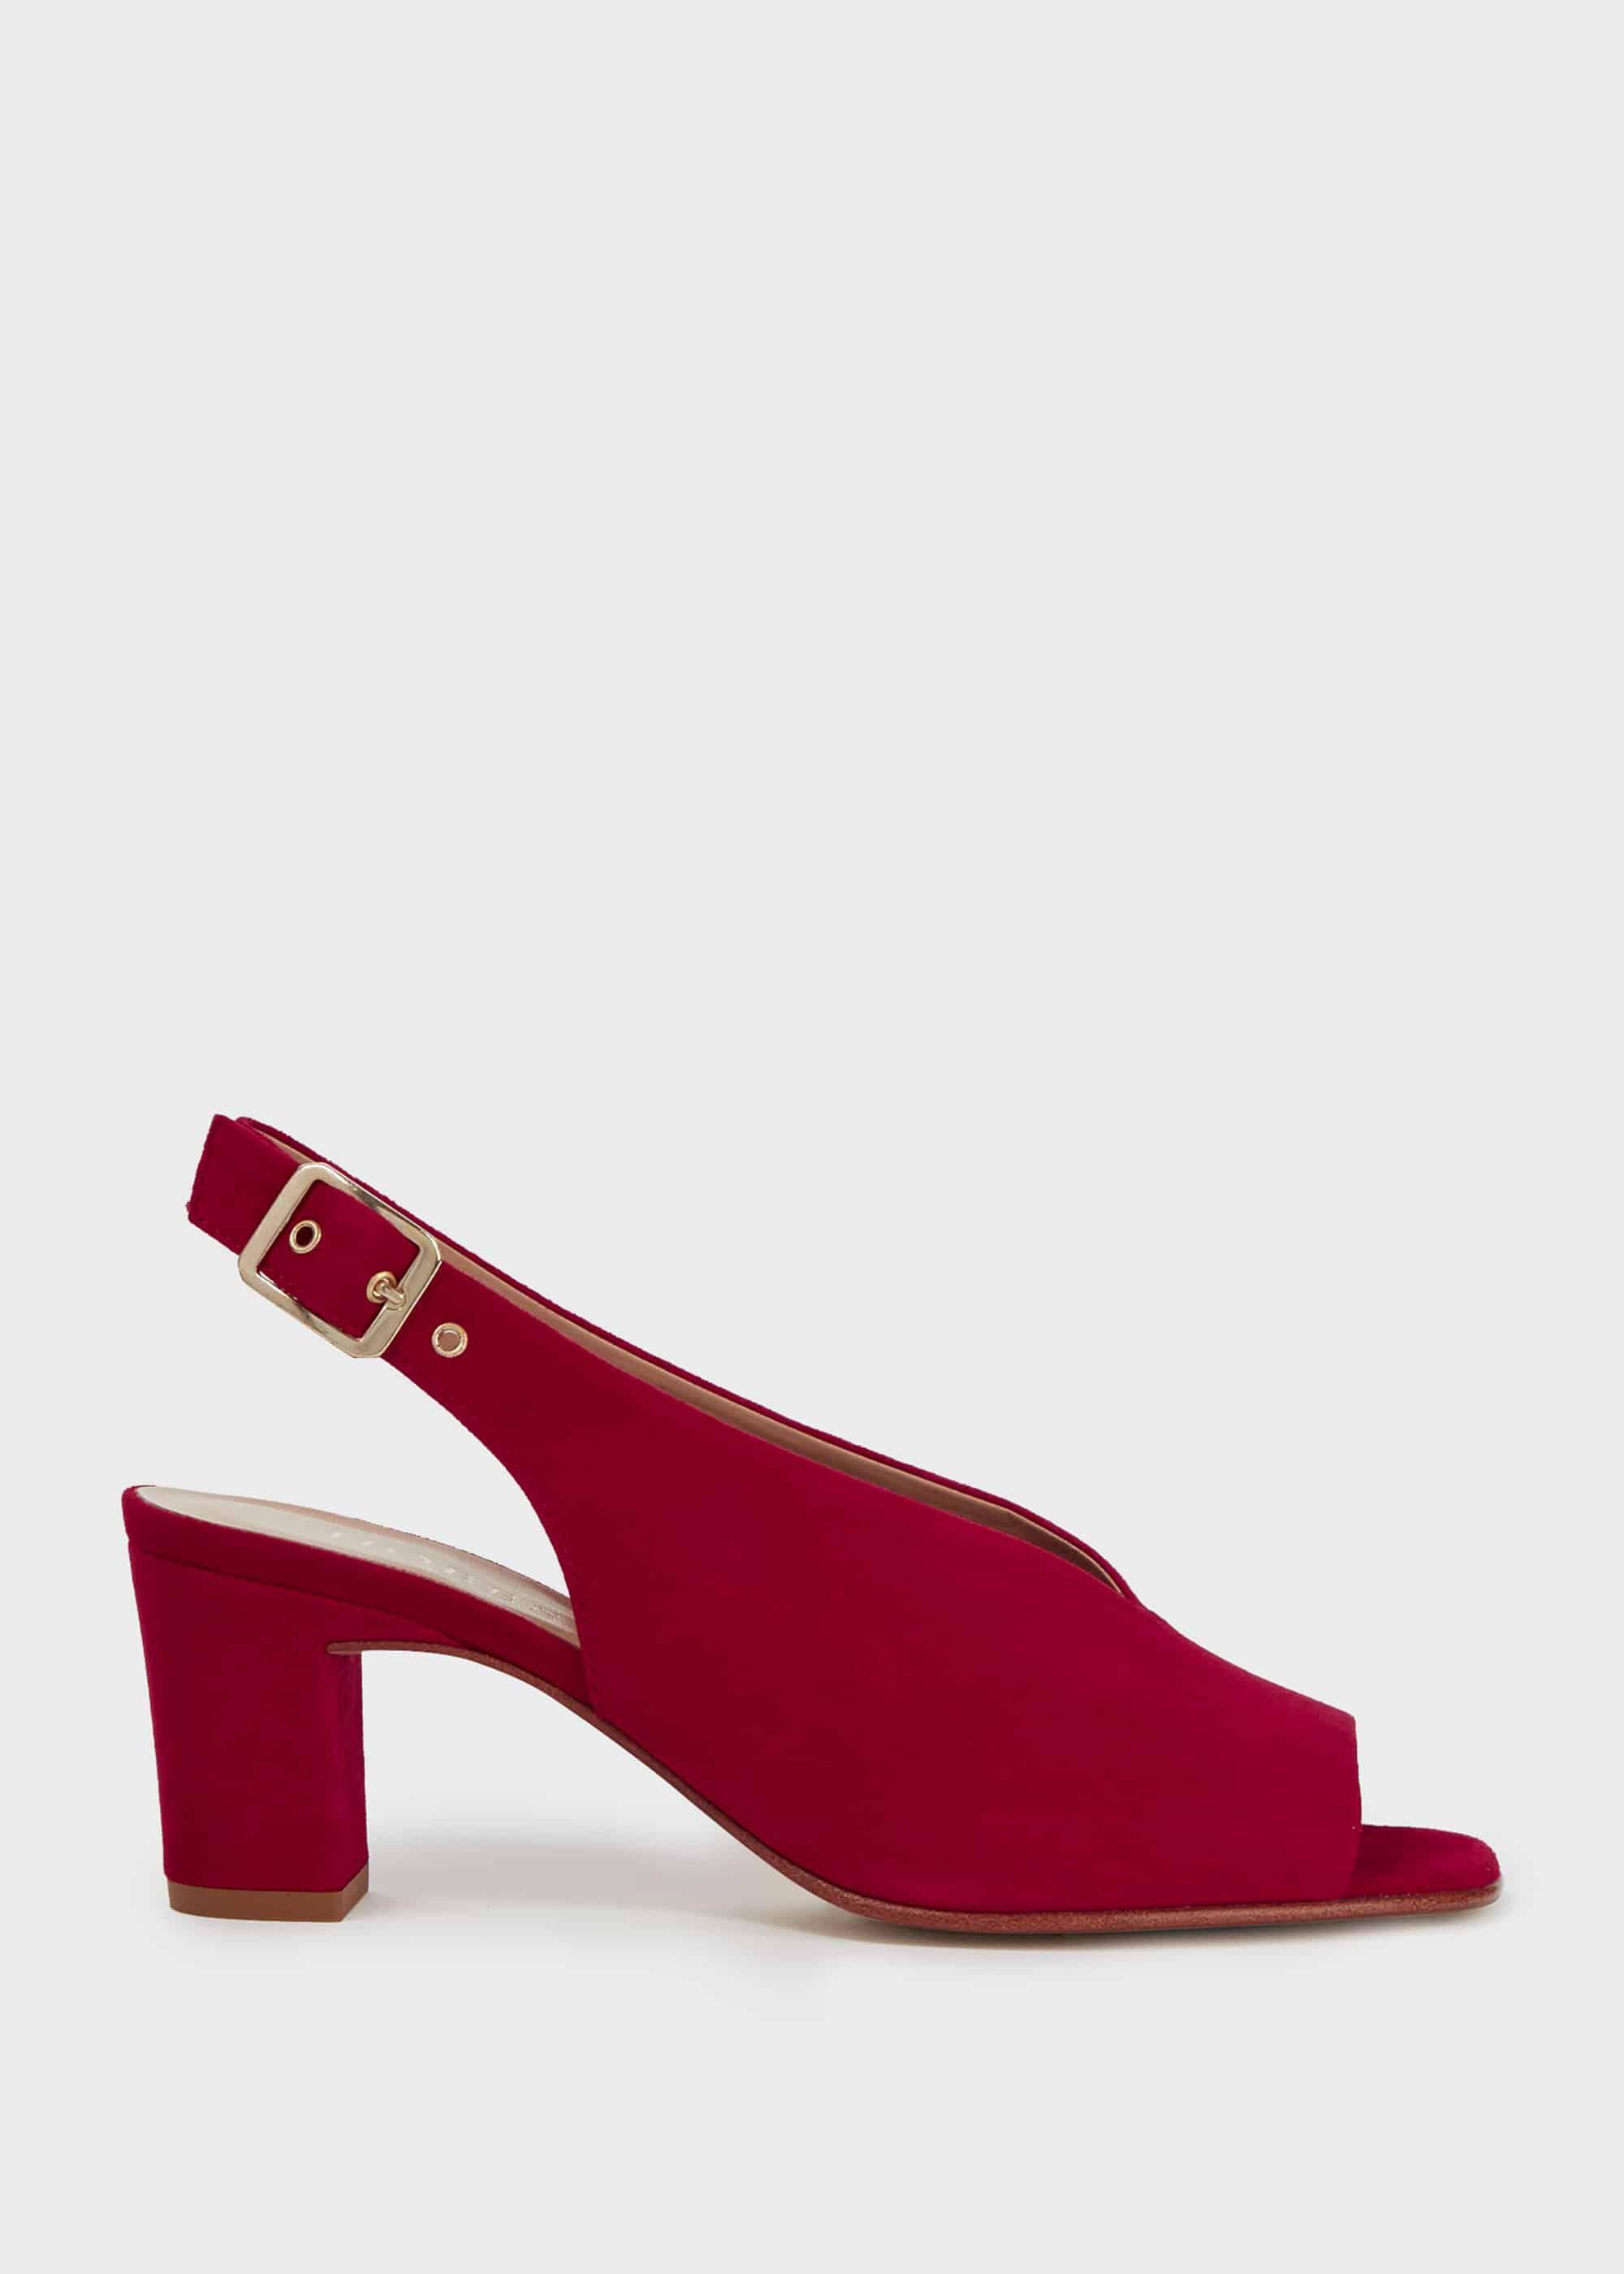 red leather block heel sandals